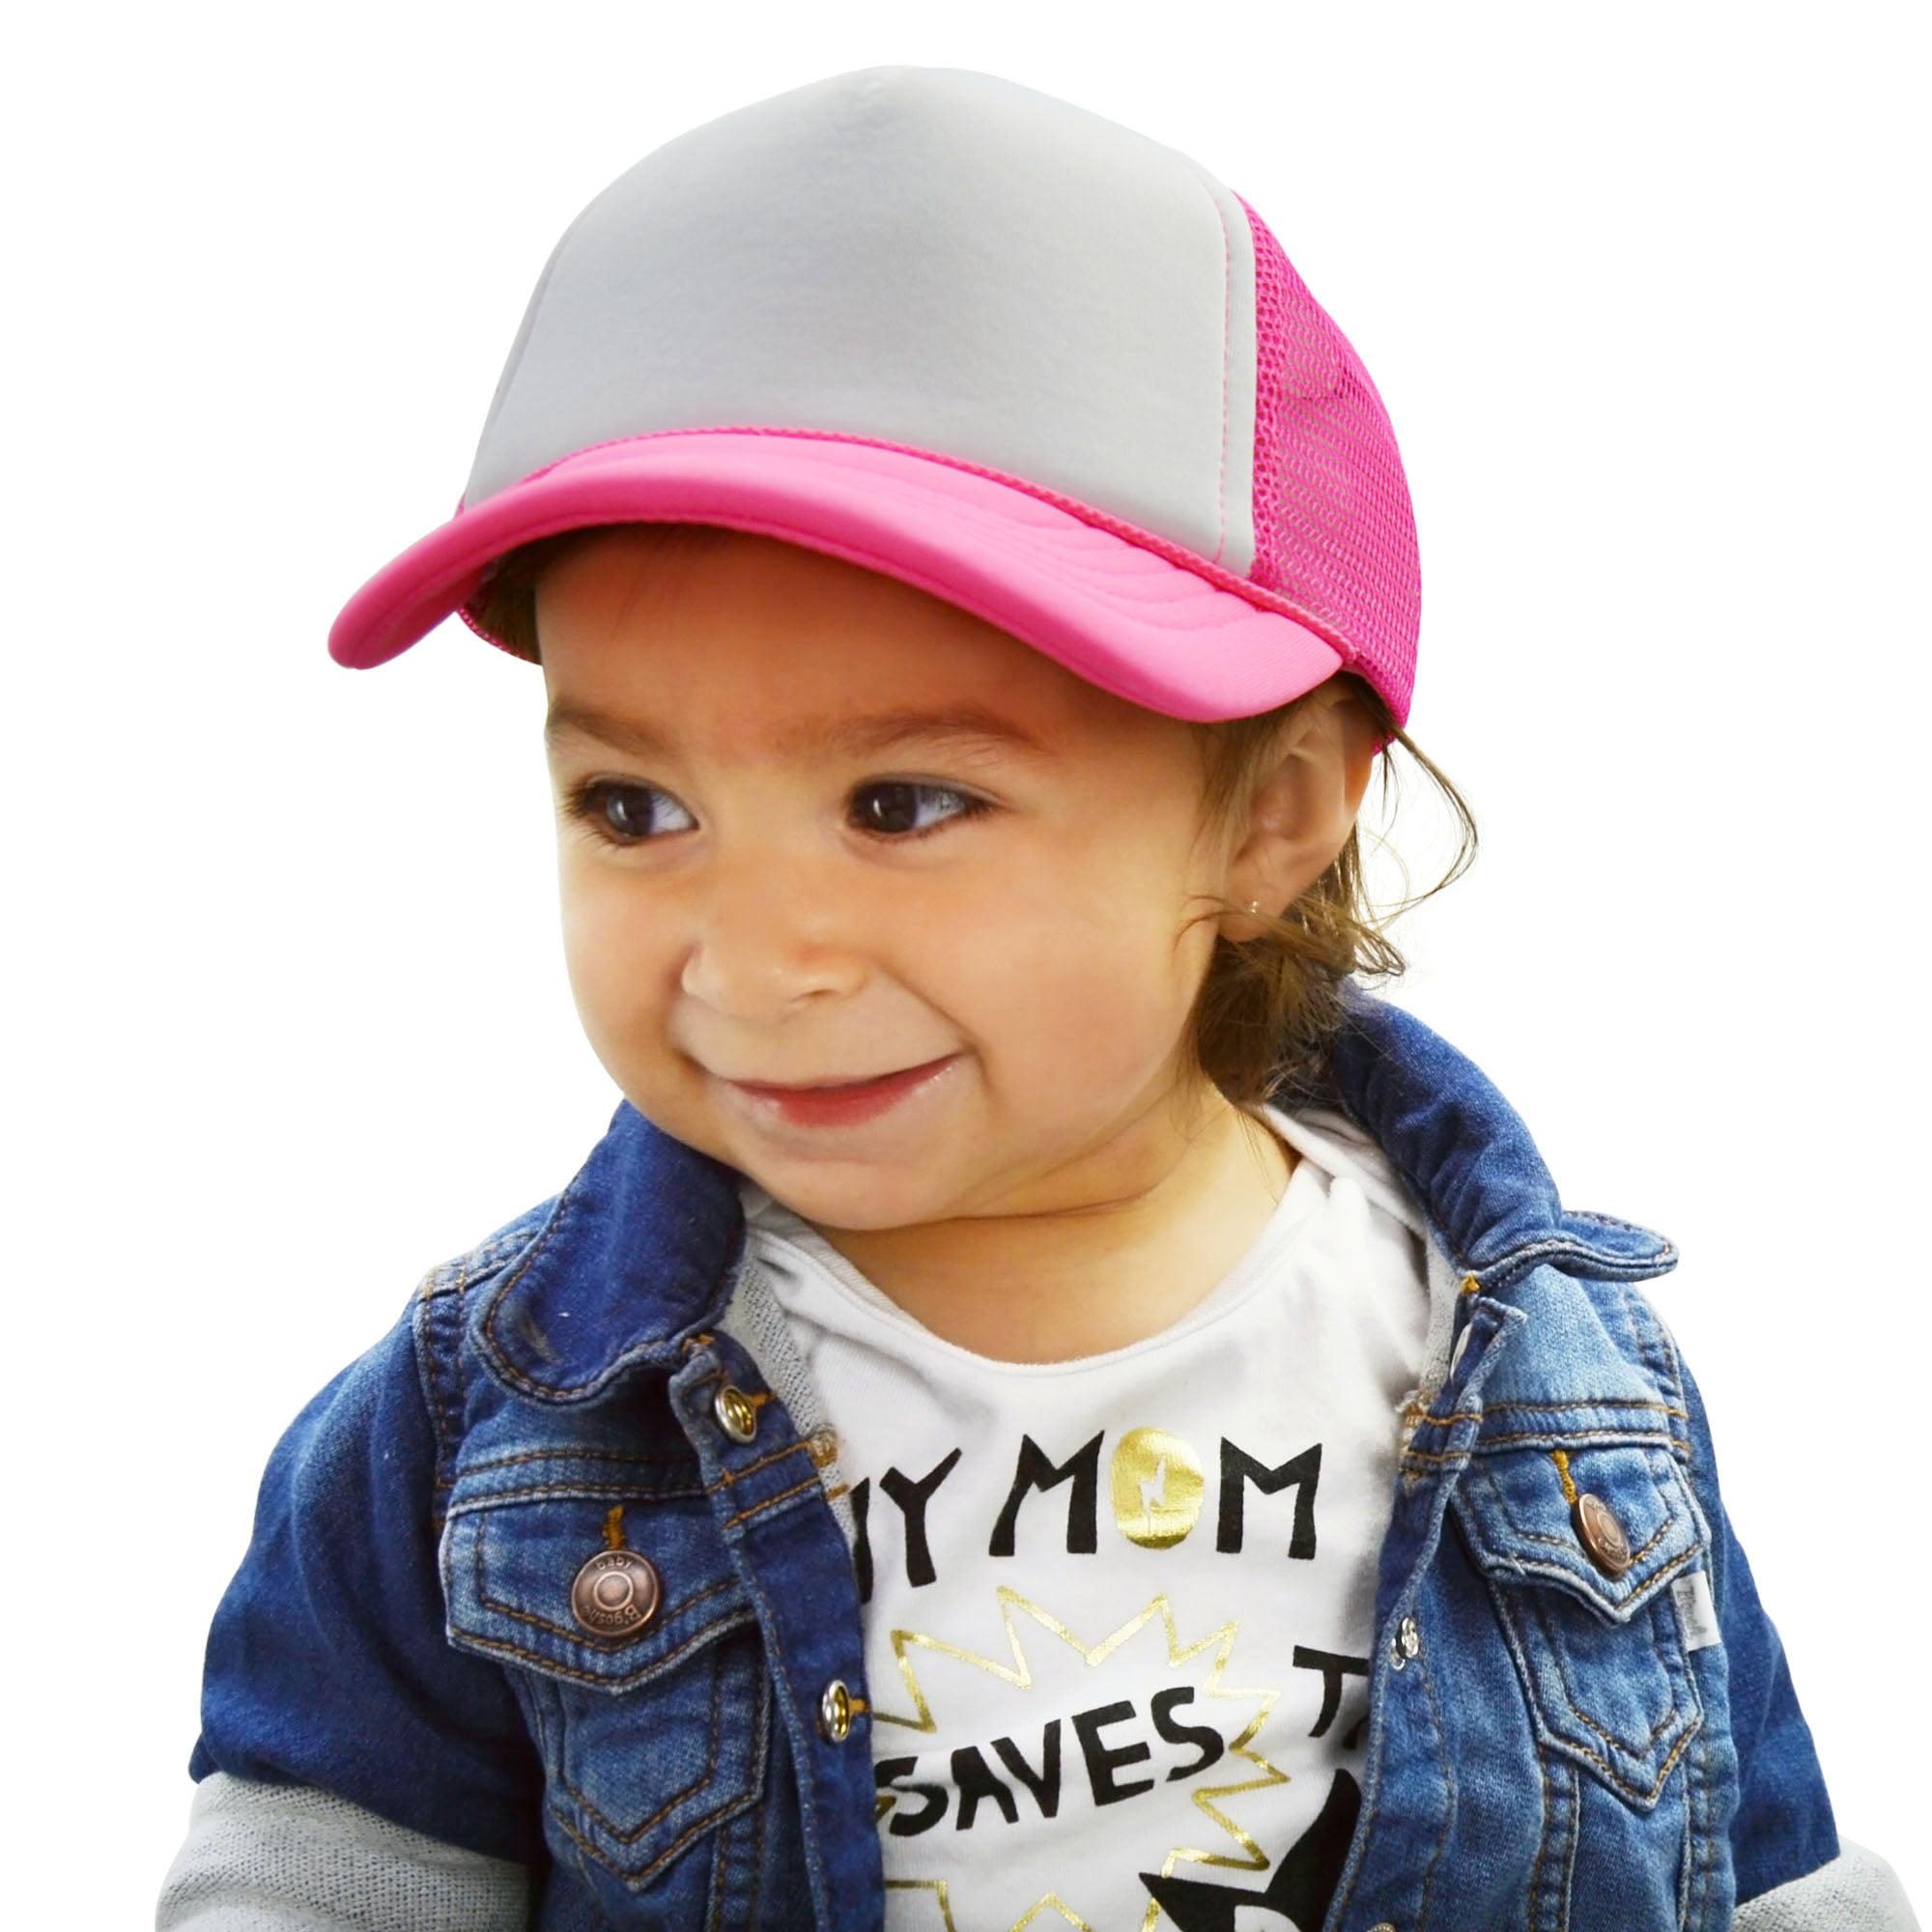 Dalix Dalix Infant Trucker Hat Baby Cap Tiny Extra Small Girls In Neon Purple White Walmart Com Walmart Com